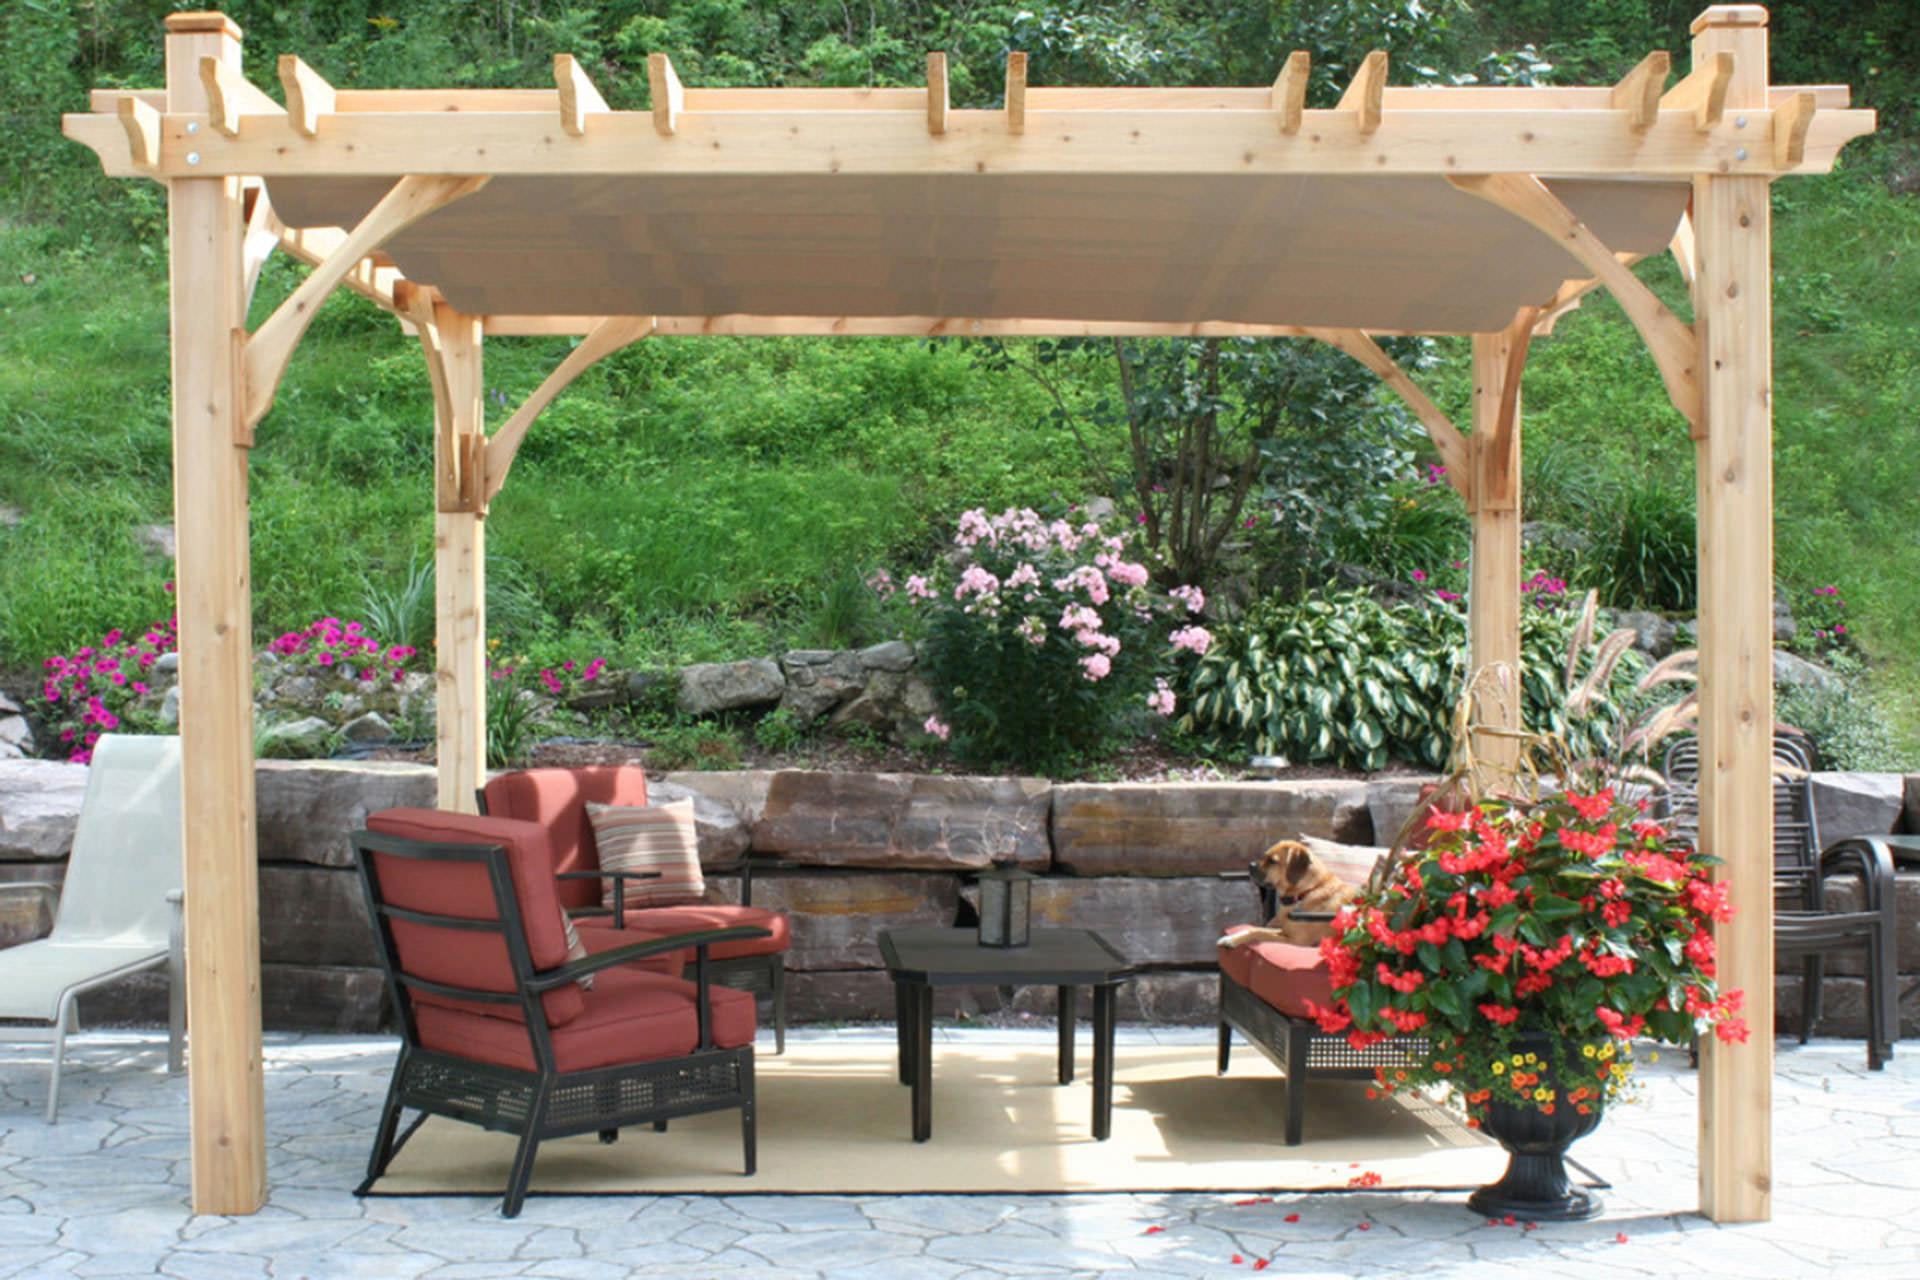 shade canopy fabrics the details of